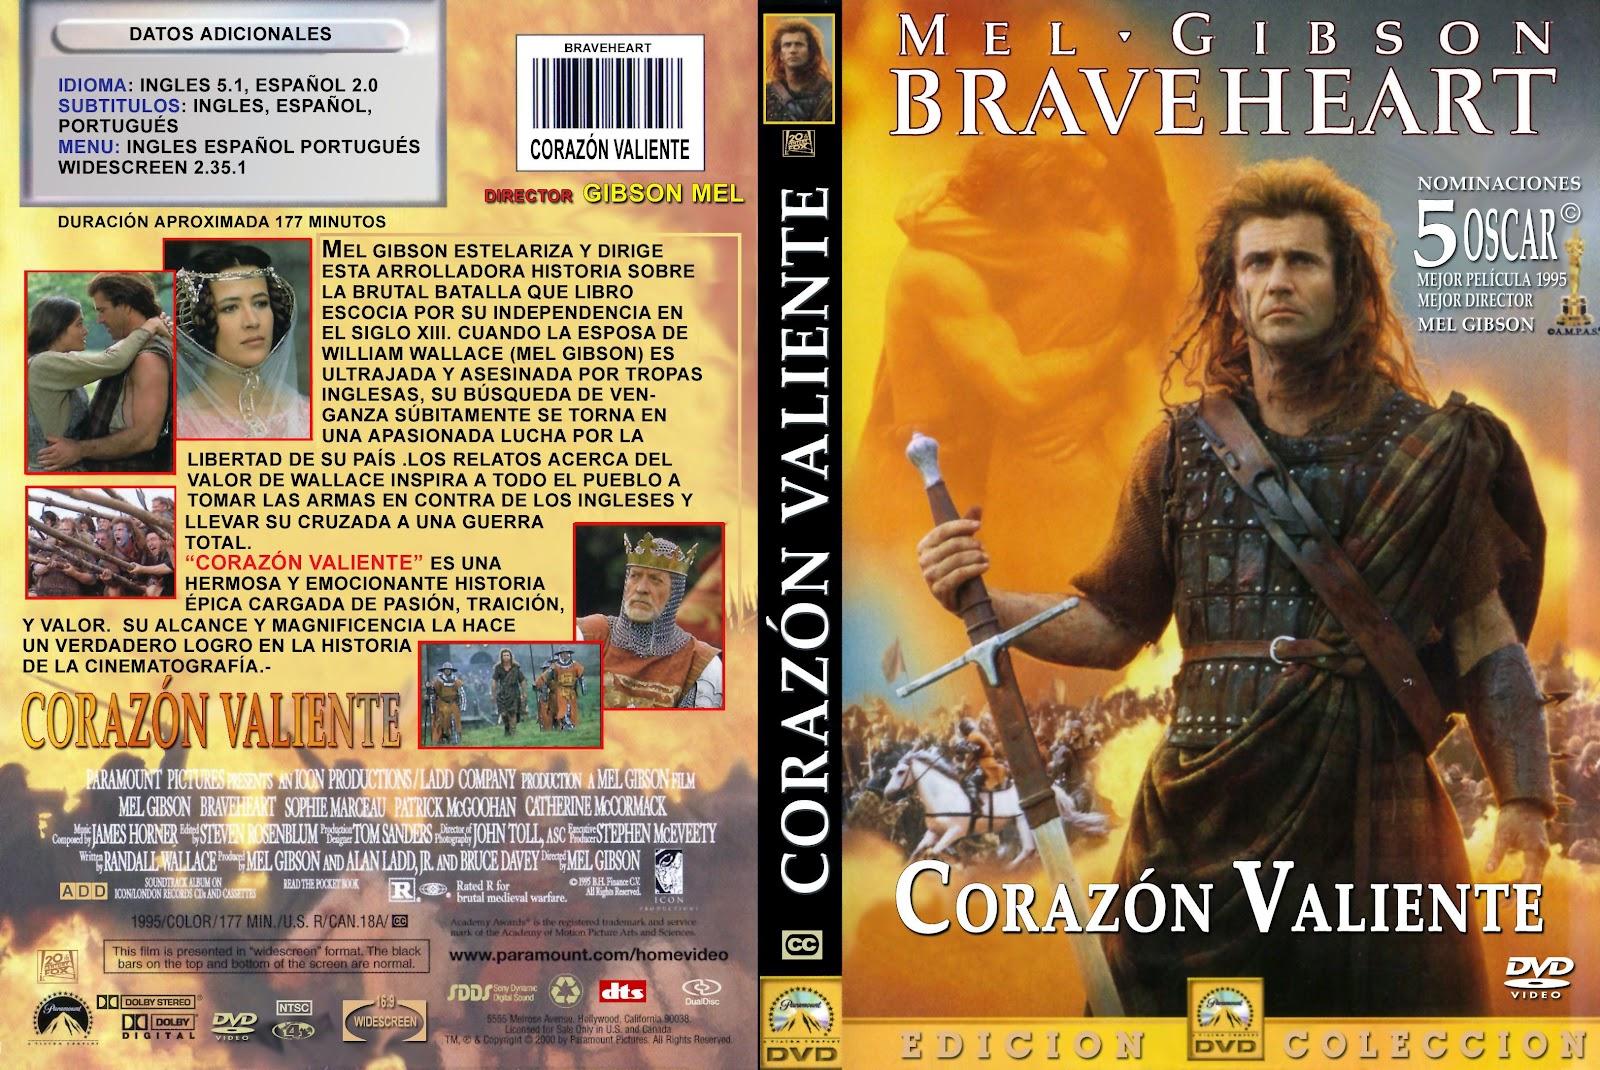 Peliculas dvd full corazon valiente braveheart Corazon valiente pelicula